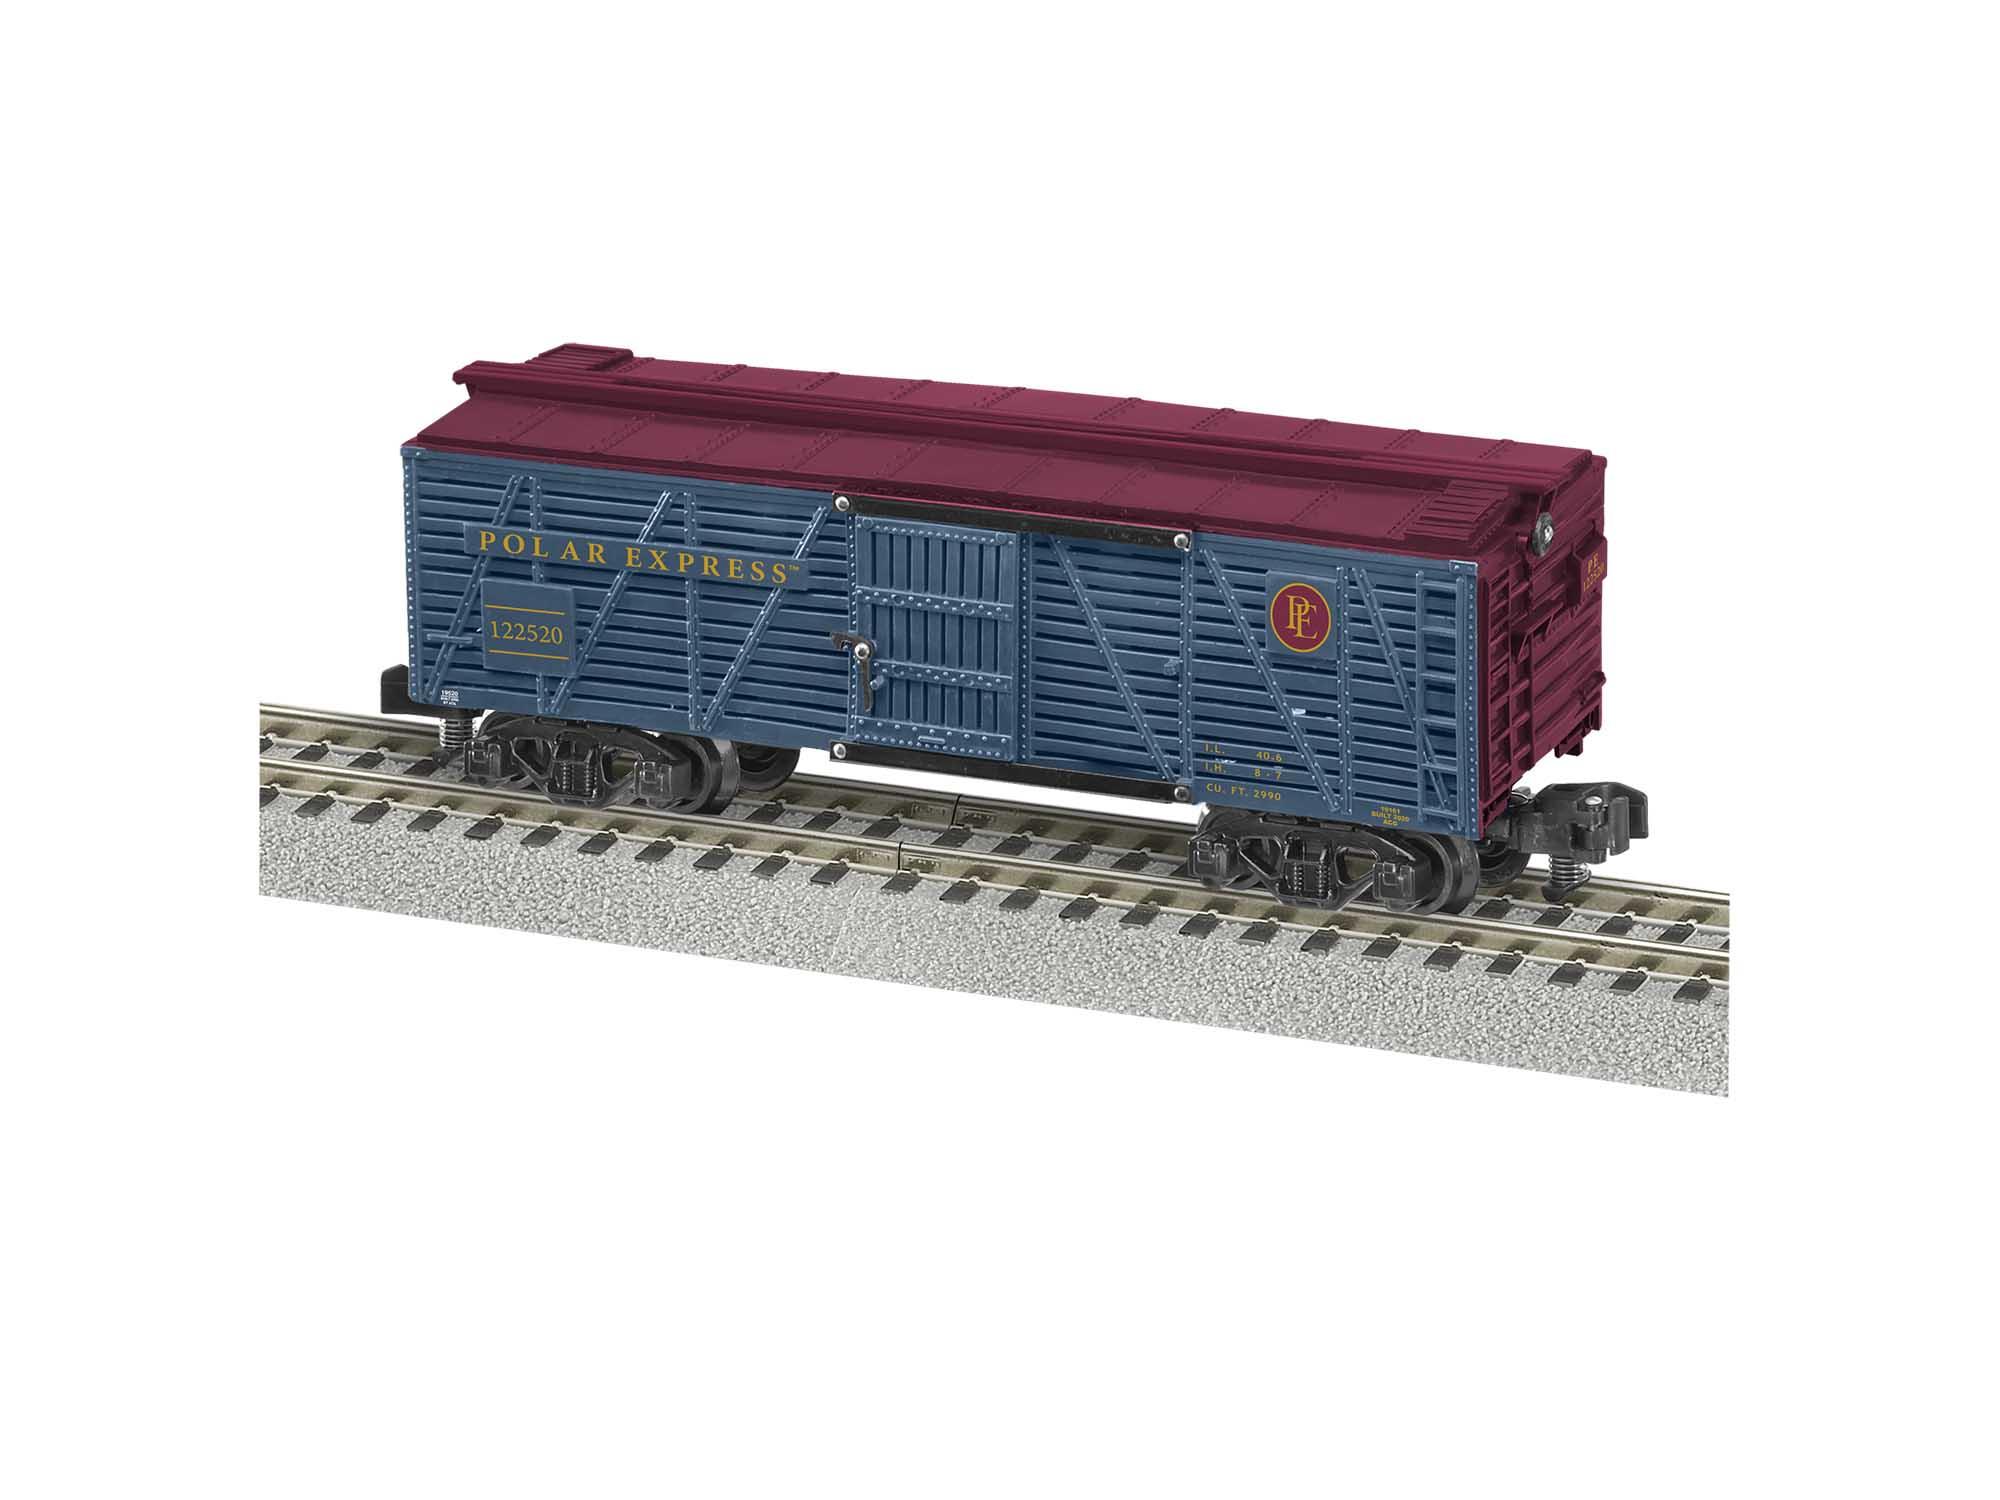 Lionel 2019540 S The Polar Express Stock Car #122520